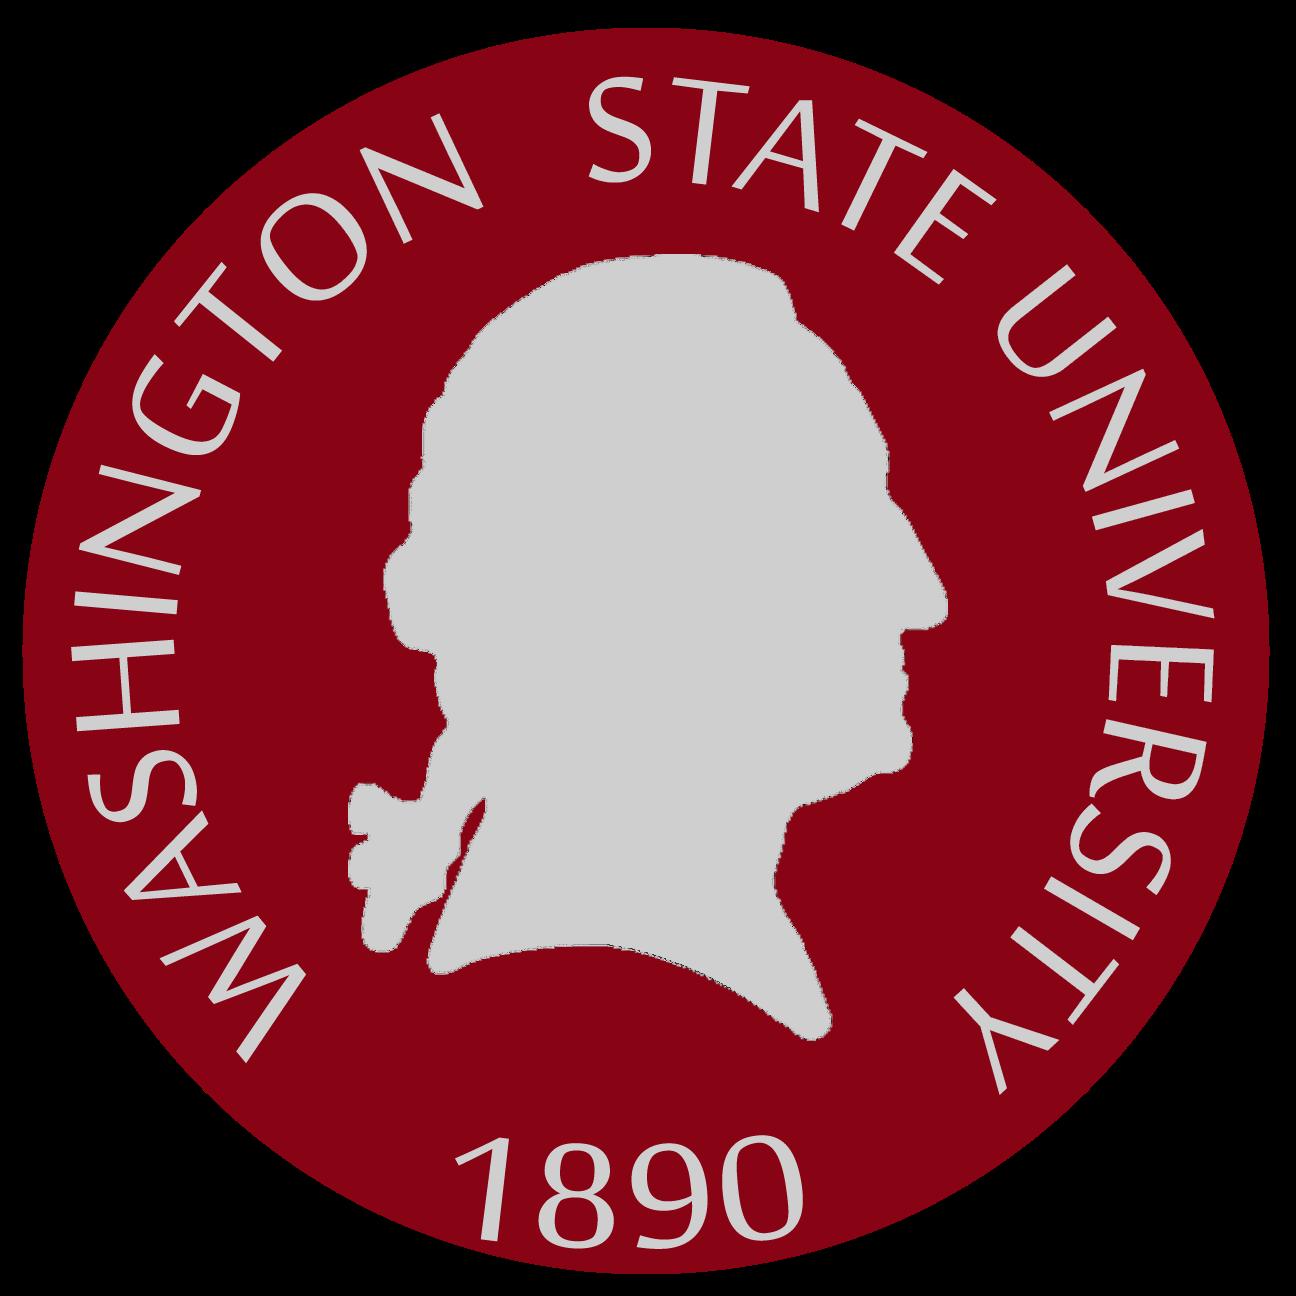 washington state online casino